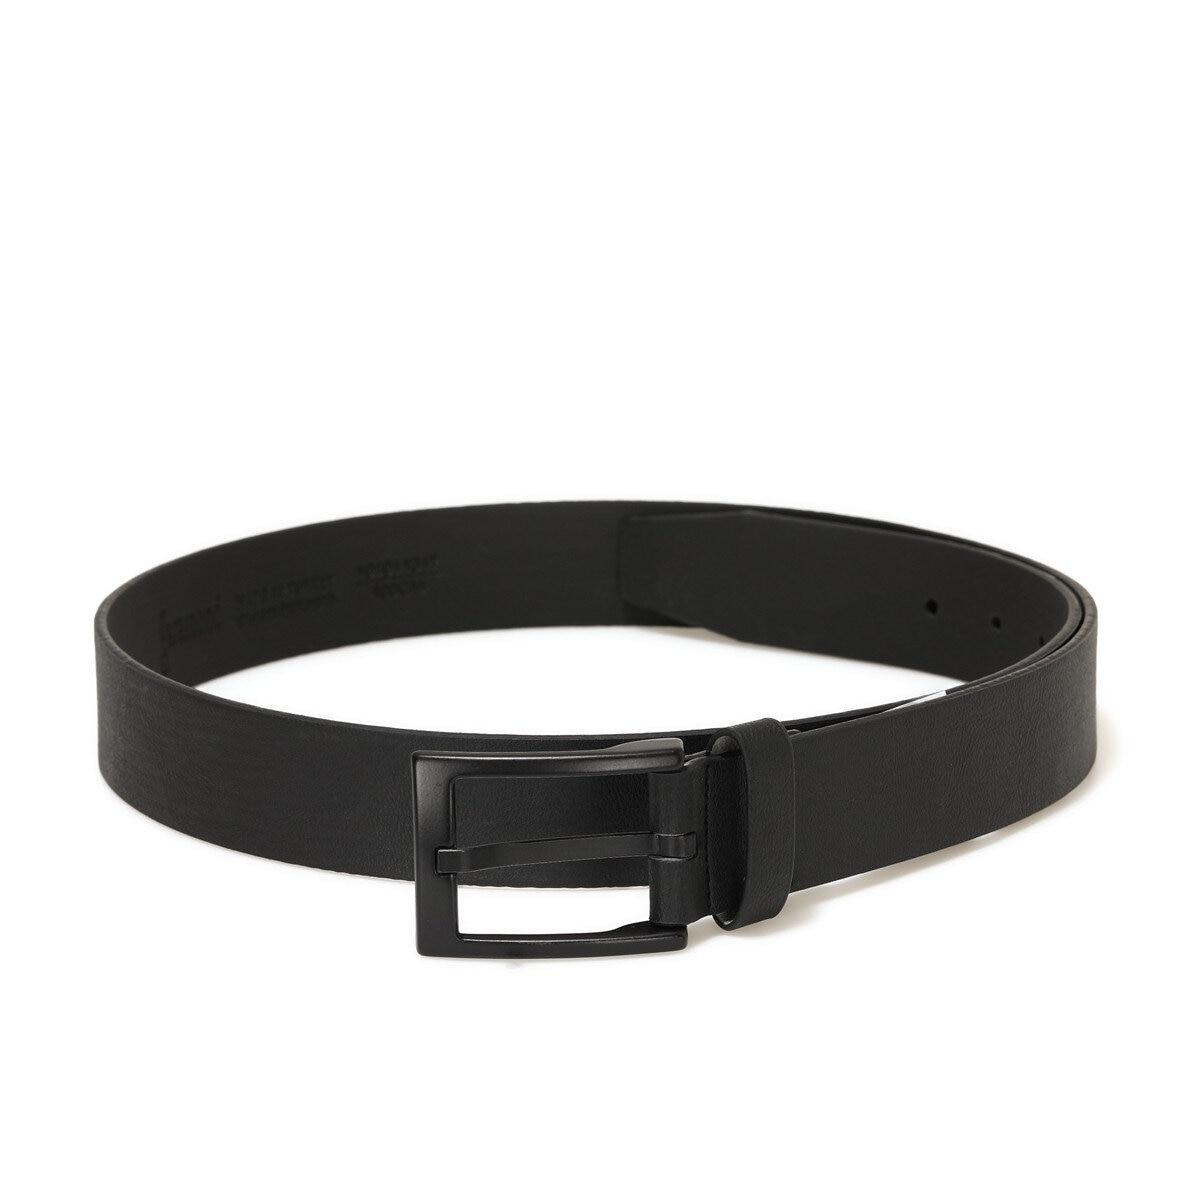 REYNOLDS 1FX Black Male Belt